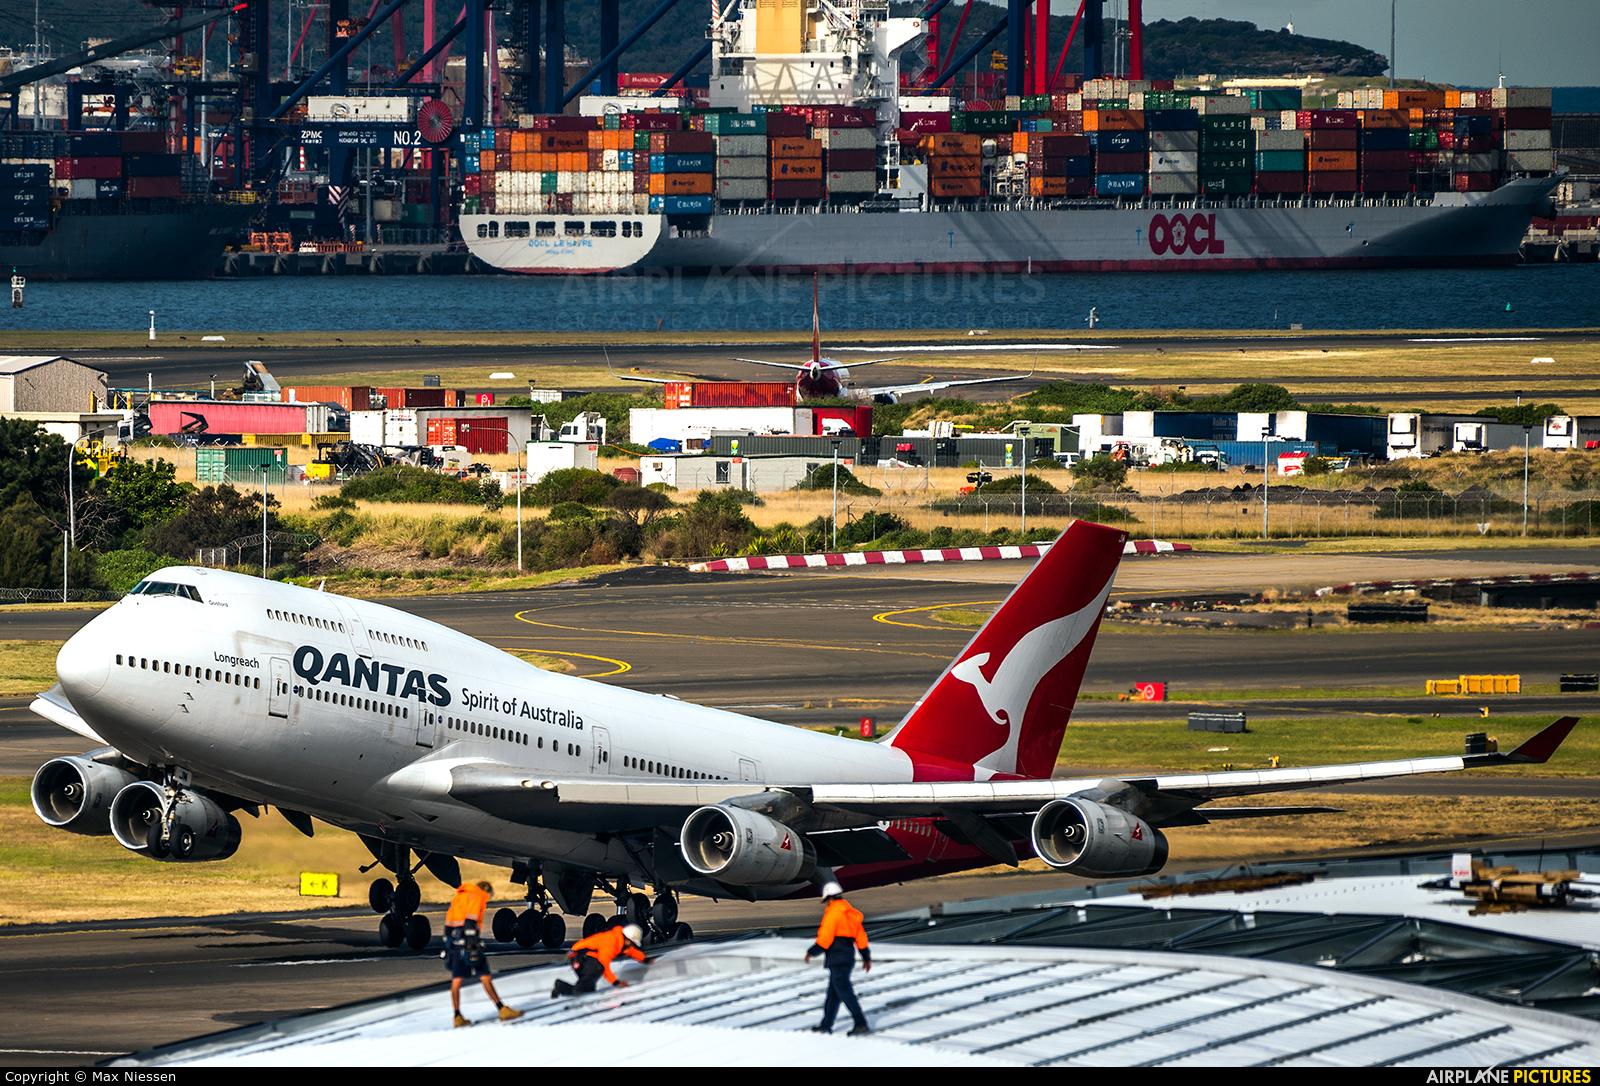 QANTAS VH-OJM aircraft at Sydney - Kingsford Smith Intl, NSW